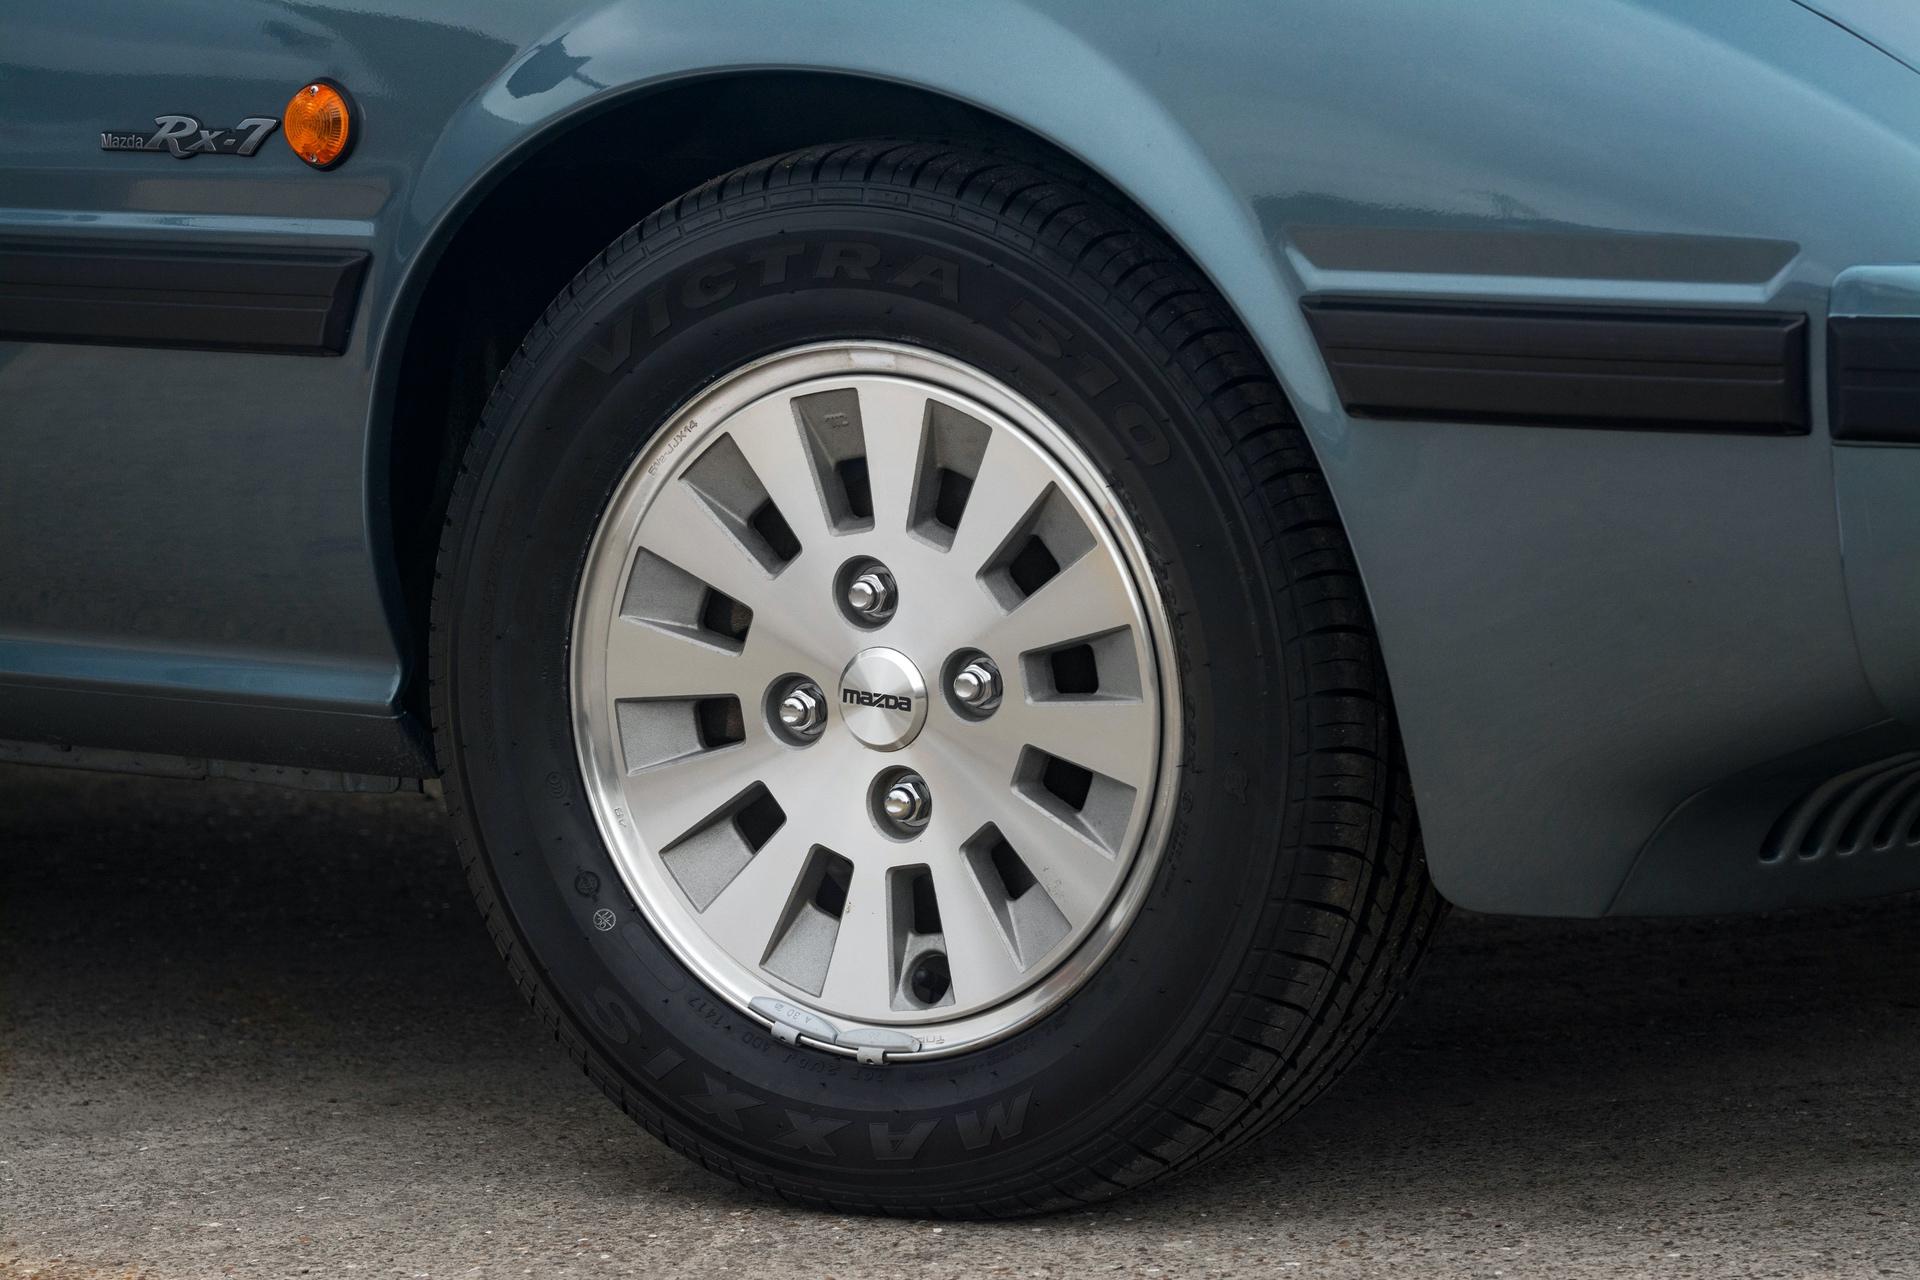 Mazda_RX-7_history_0036